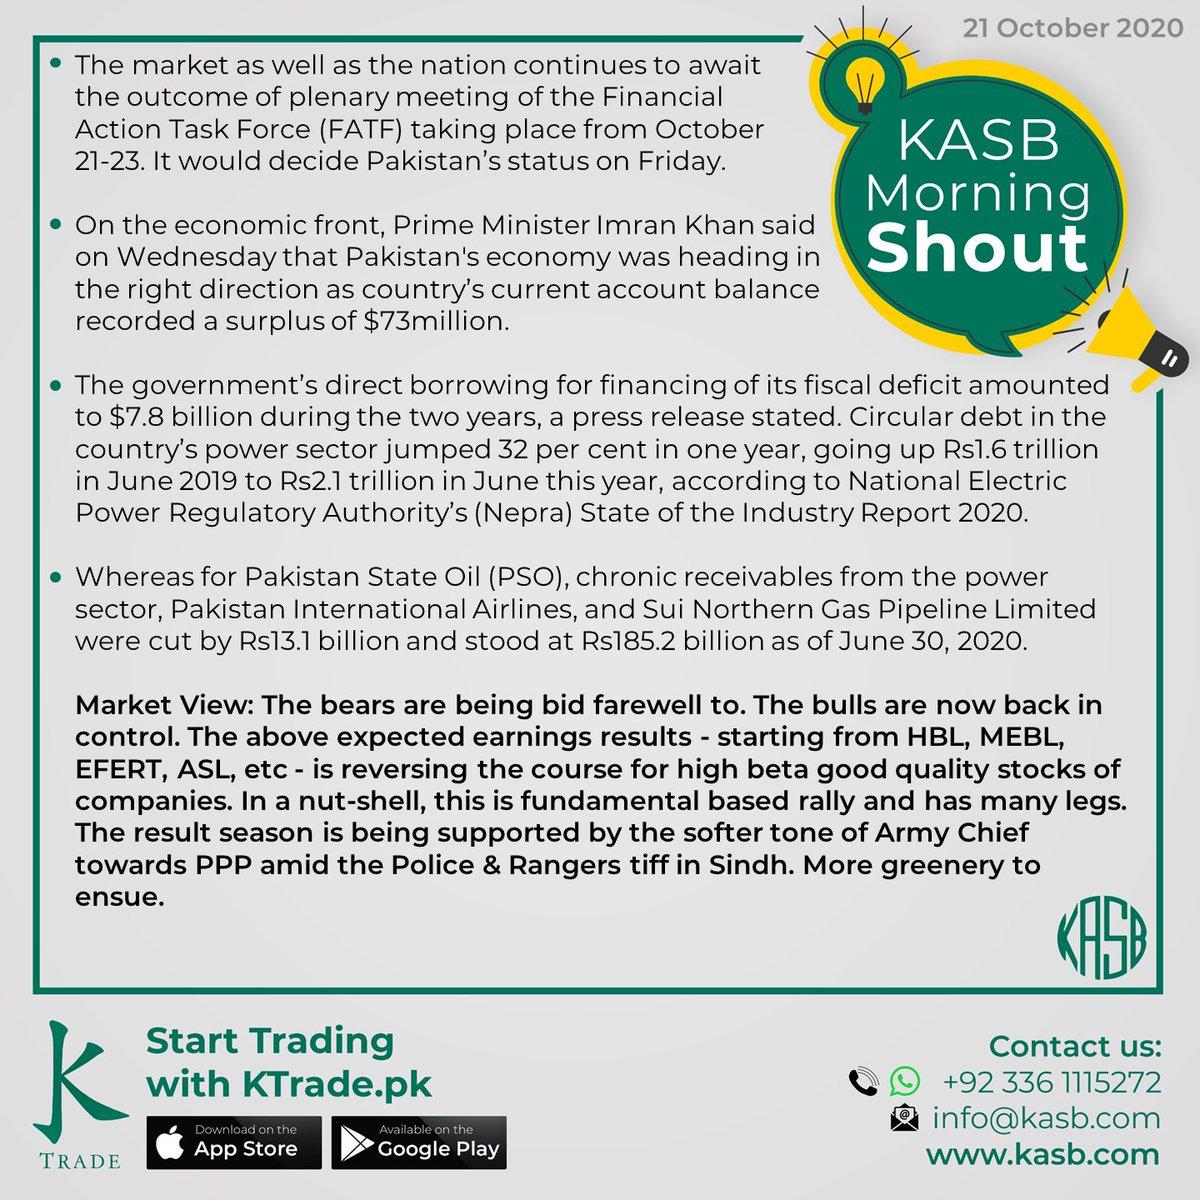 KASB Morning Shout: Our views on today's news #kasb #smartinvesting #psx #stockmarket #KTrade #onlinetrading #pakistaneconomy #imrankhan #sbp #inflation #kse100 #brokeragehouse #psxstocks #marketupdate #emergingmarkets #frontiermarkets #news #morning #today #views https://t.co/EOpHVYbOsL